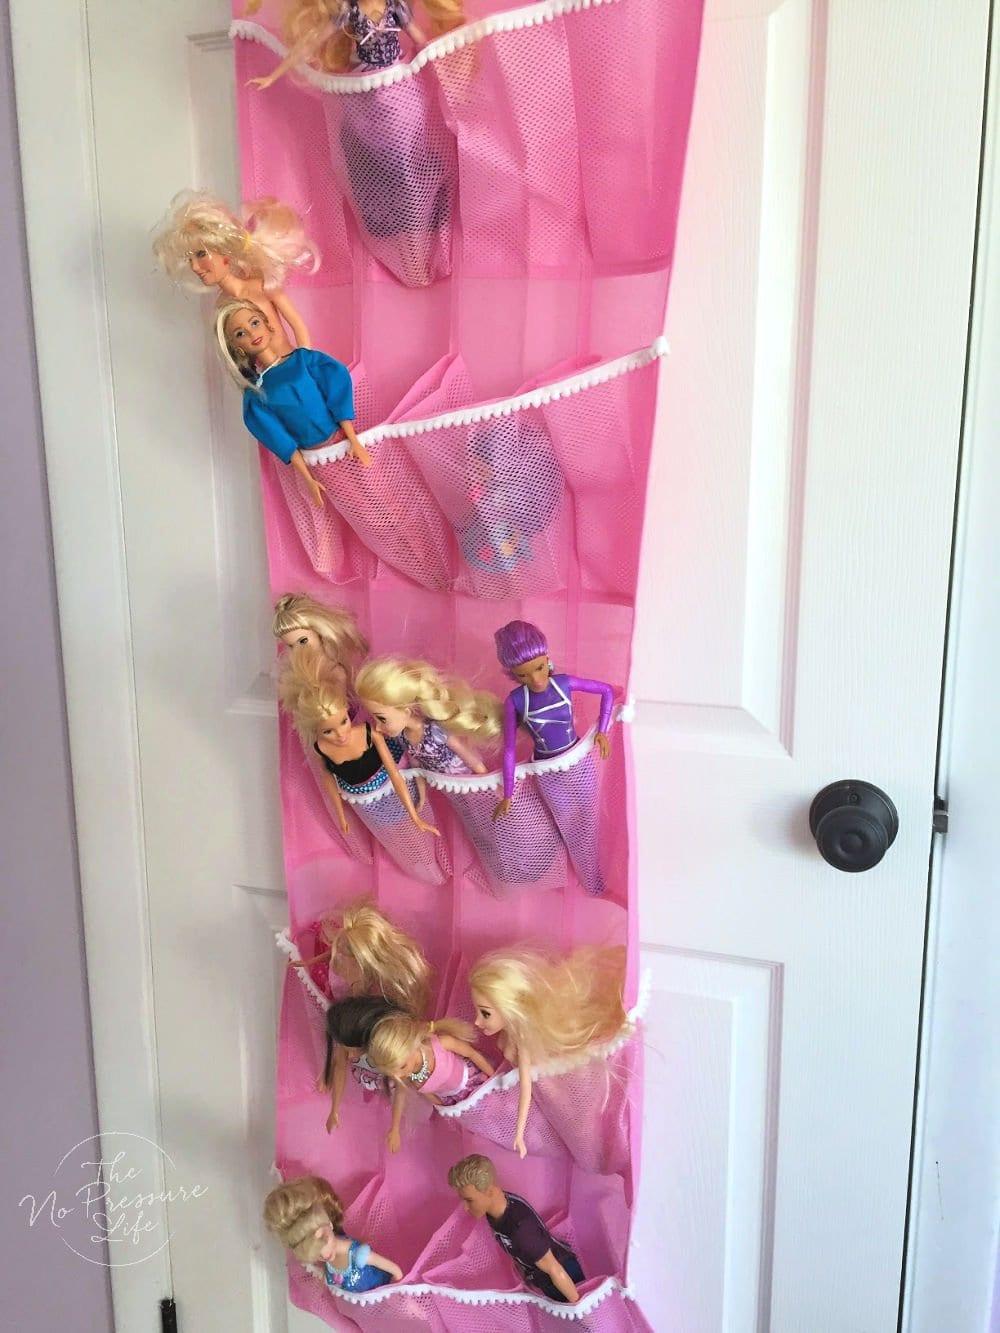 Barbie storage idea - hanging organizer for Barbies